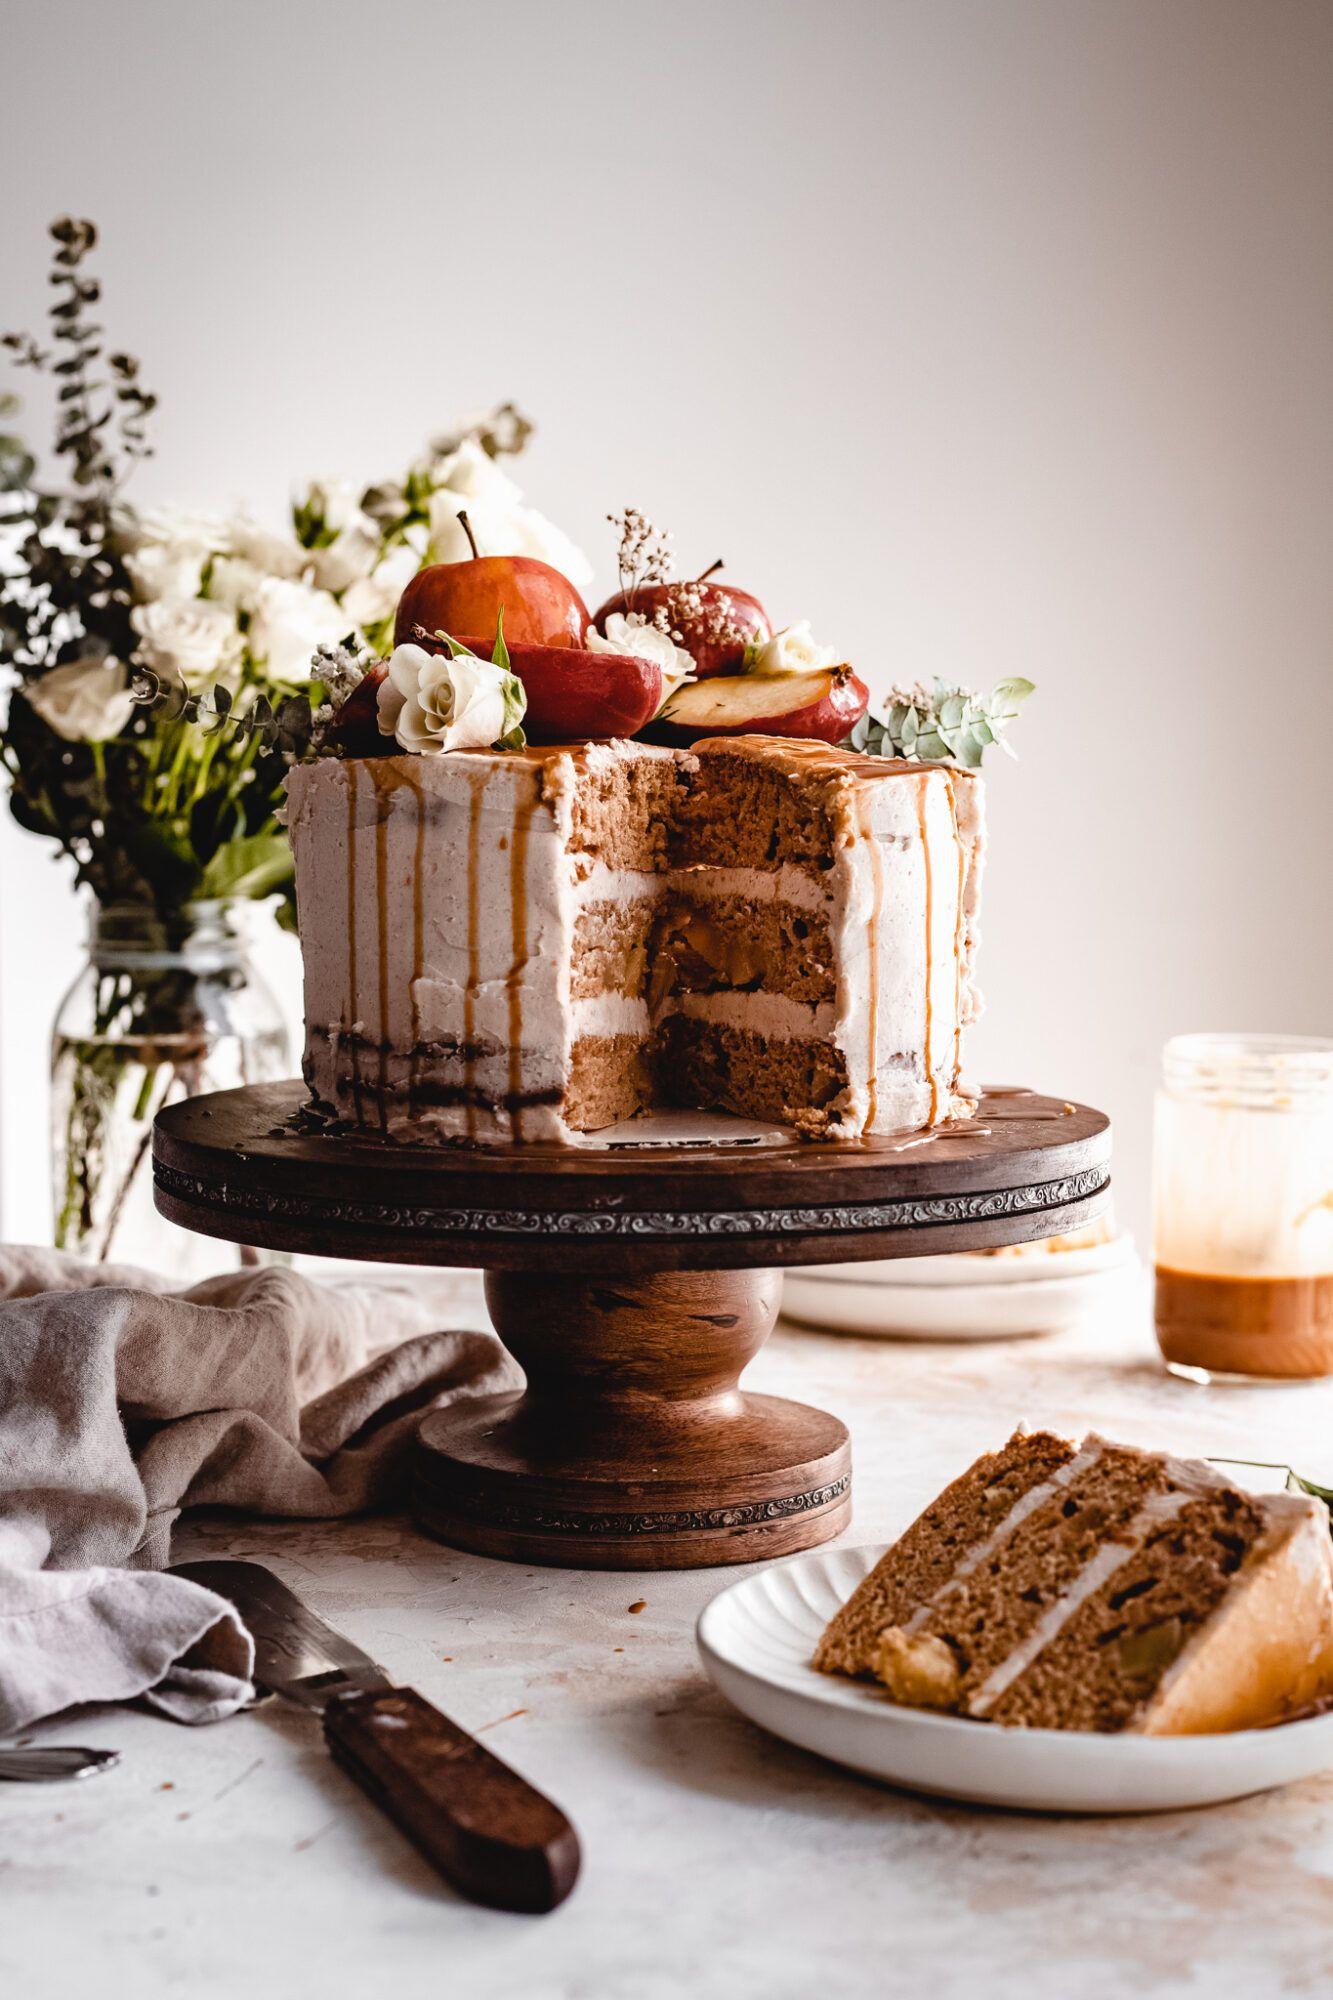 Vegan Apple Spice Cake With Cinnamon Caramel Frosting The Banana Diaries Recipe In 2020 Apple Spice Cake Apple Spice Cake Recipe Cinnamon Recipes